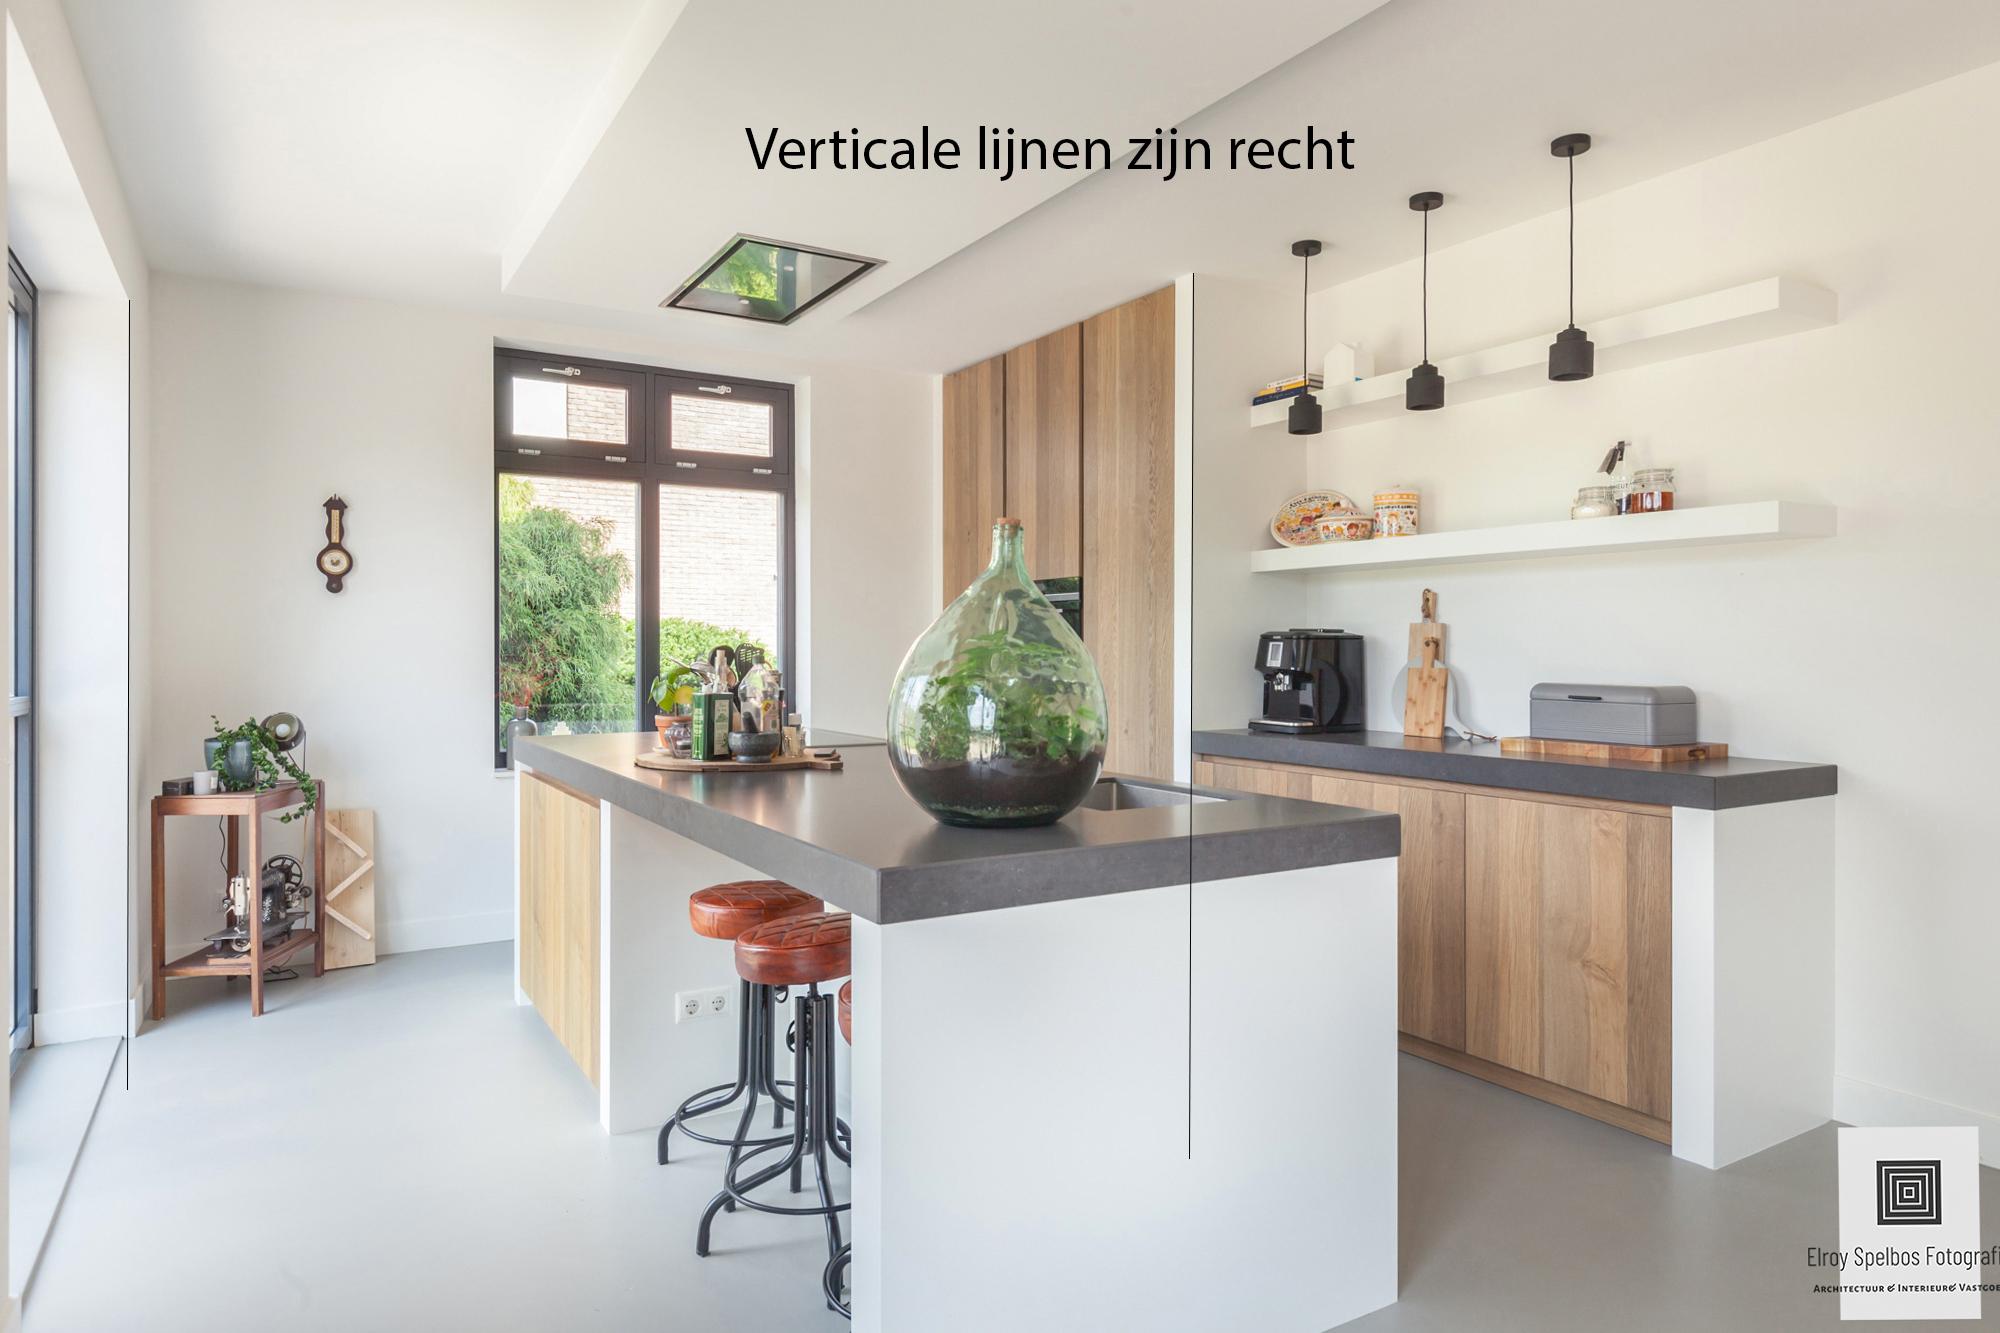 Interieurfotografie tips